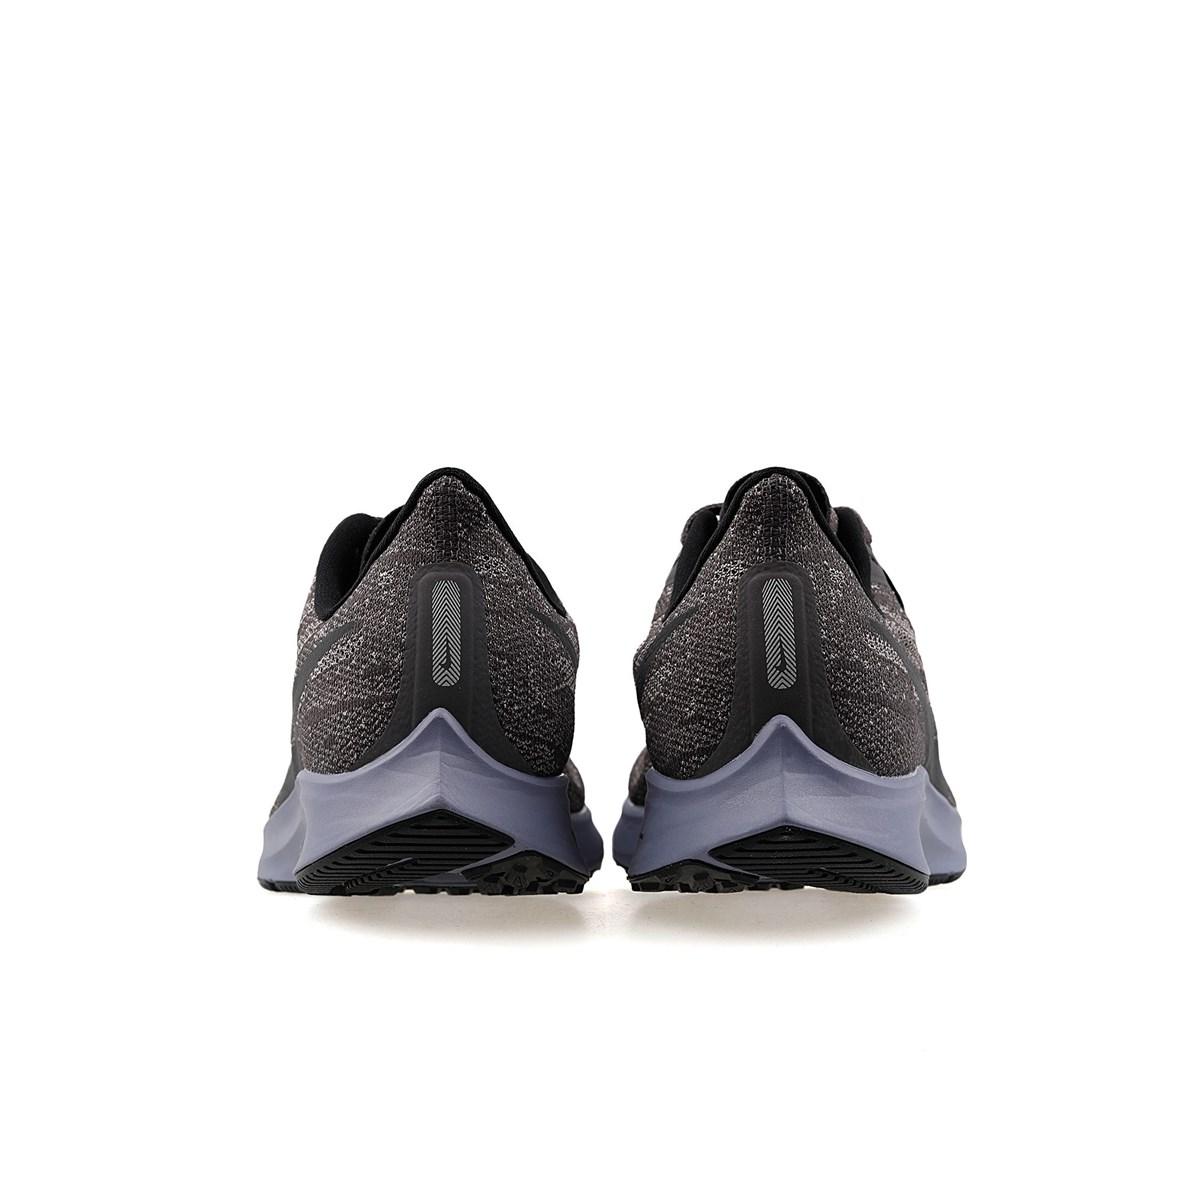 Air Zoom Pegasus 36 Antrasit Koşu Ayakkabısı